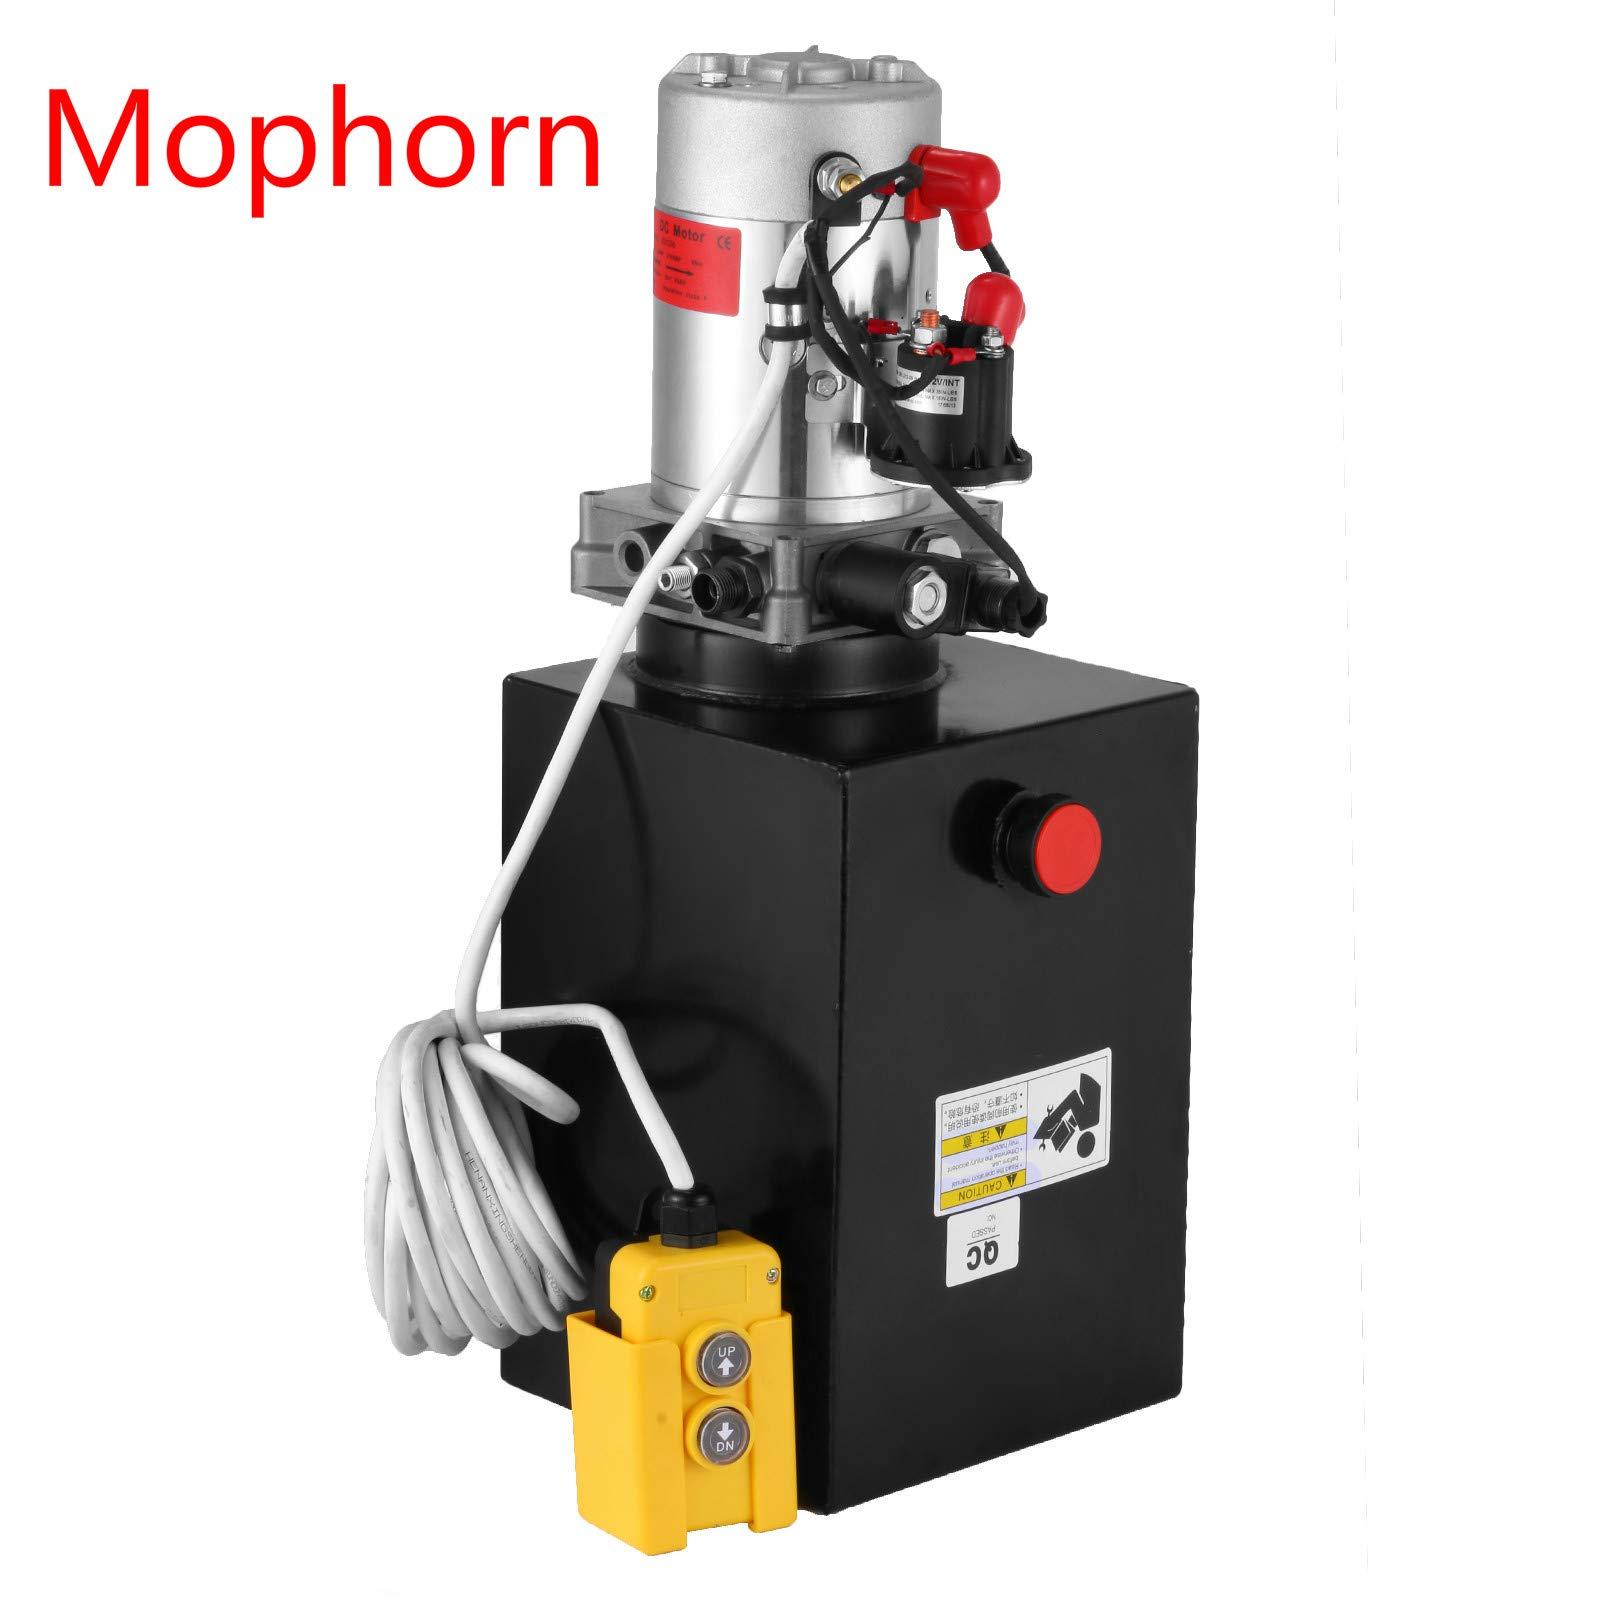 Mophorn 12 Volt Single Acting 12 Quart Metal Reservoir Hydraulic Pump Power Supply Unit for 3200PSI Dump Trailer with Remote Control 3.17 Gallon Truck Car Lift